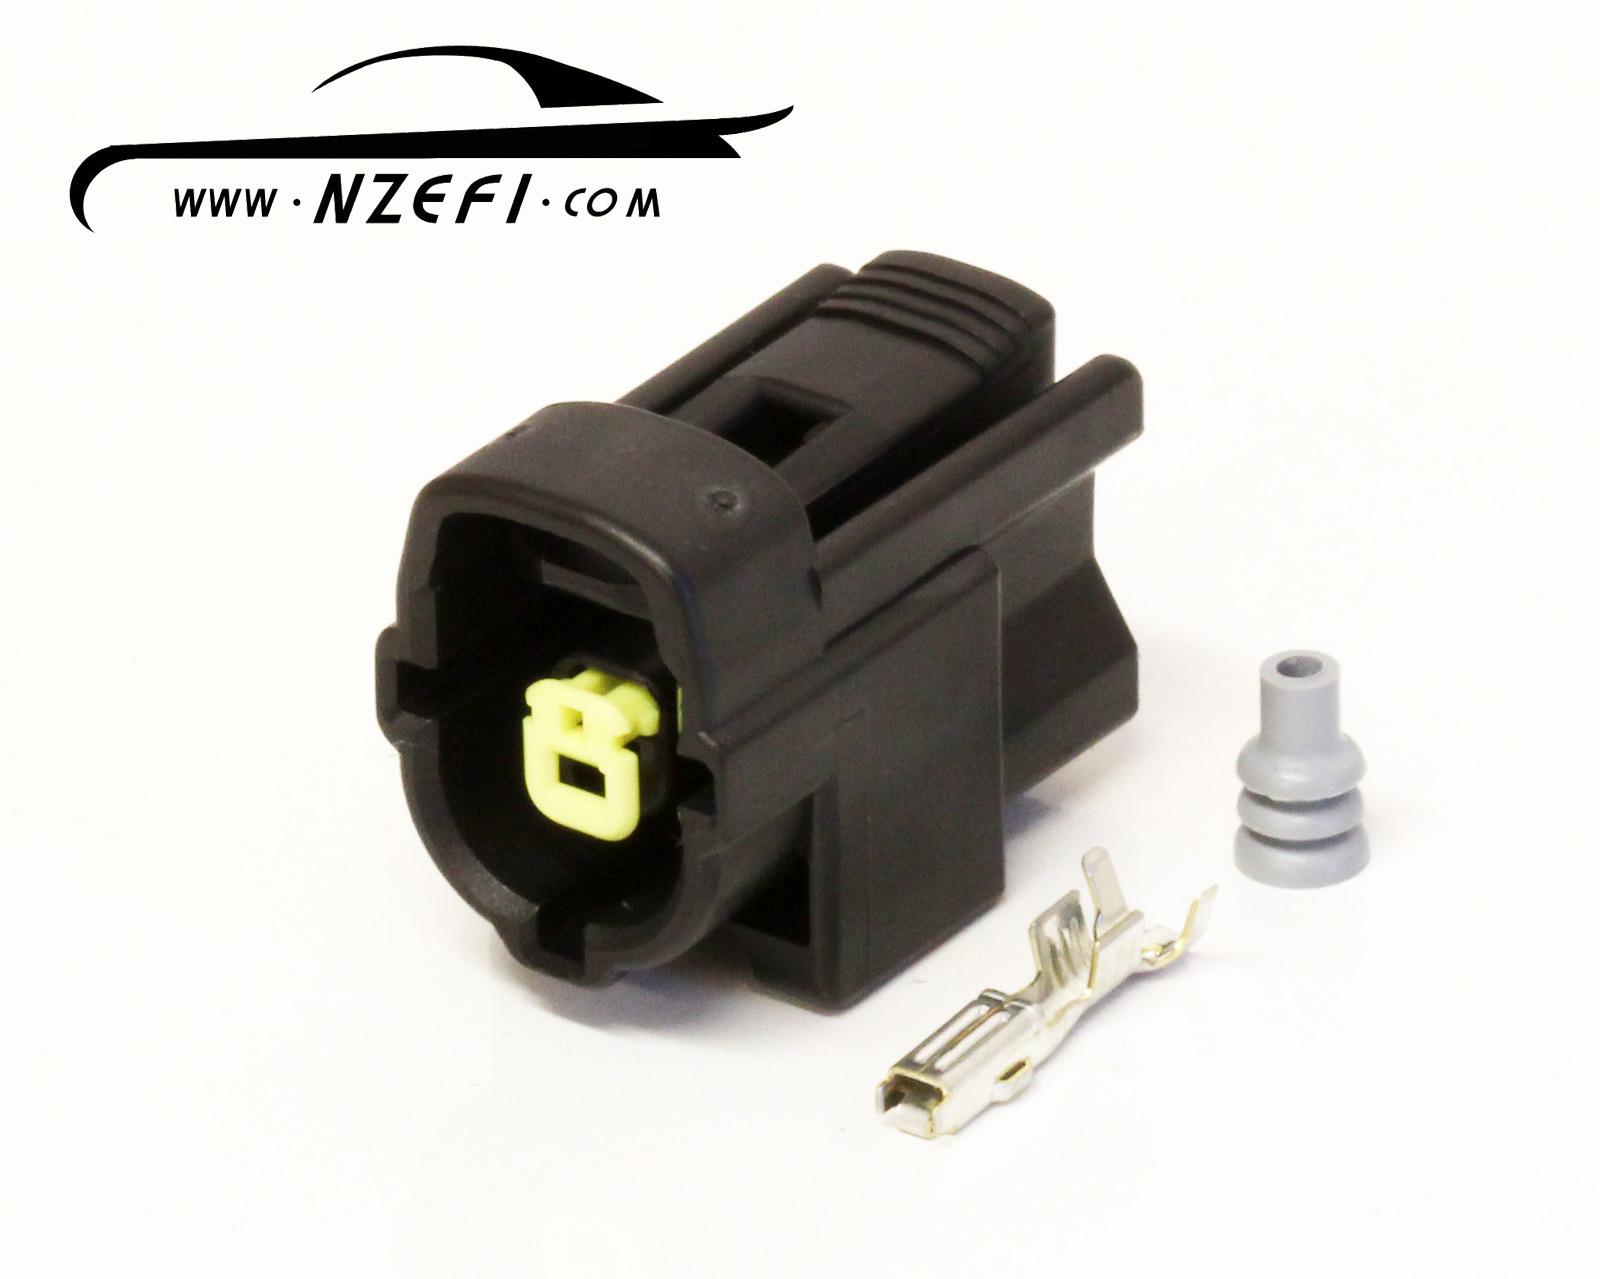 Mazda Rx7 Fd Knock Sensor Connector Engine Loom Side Nzefi Wiring 1 Pin Fd3s